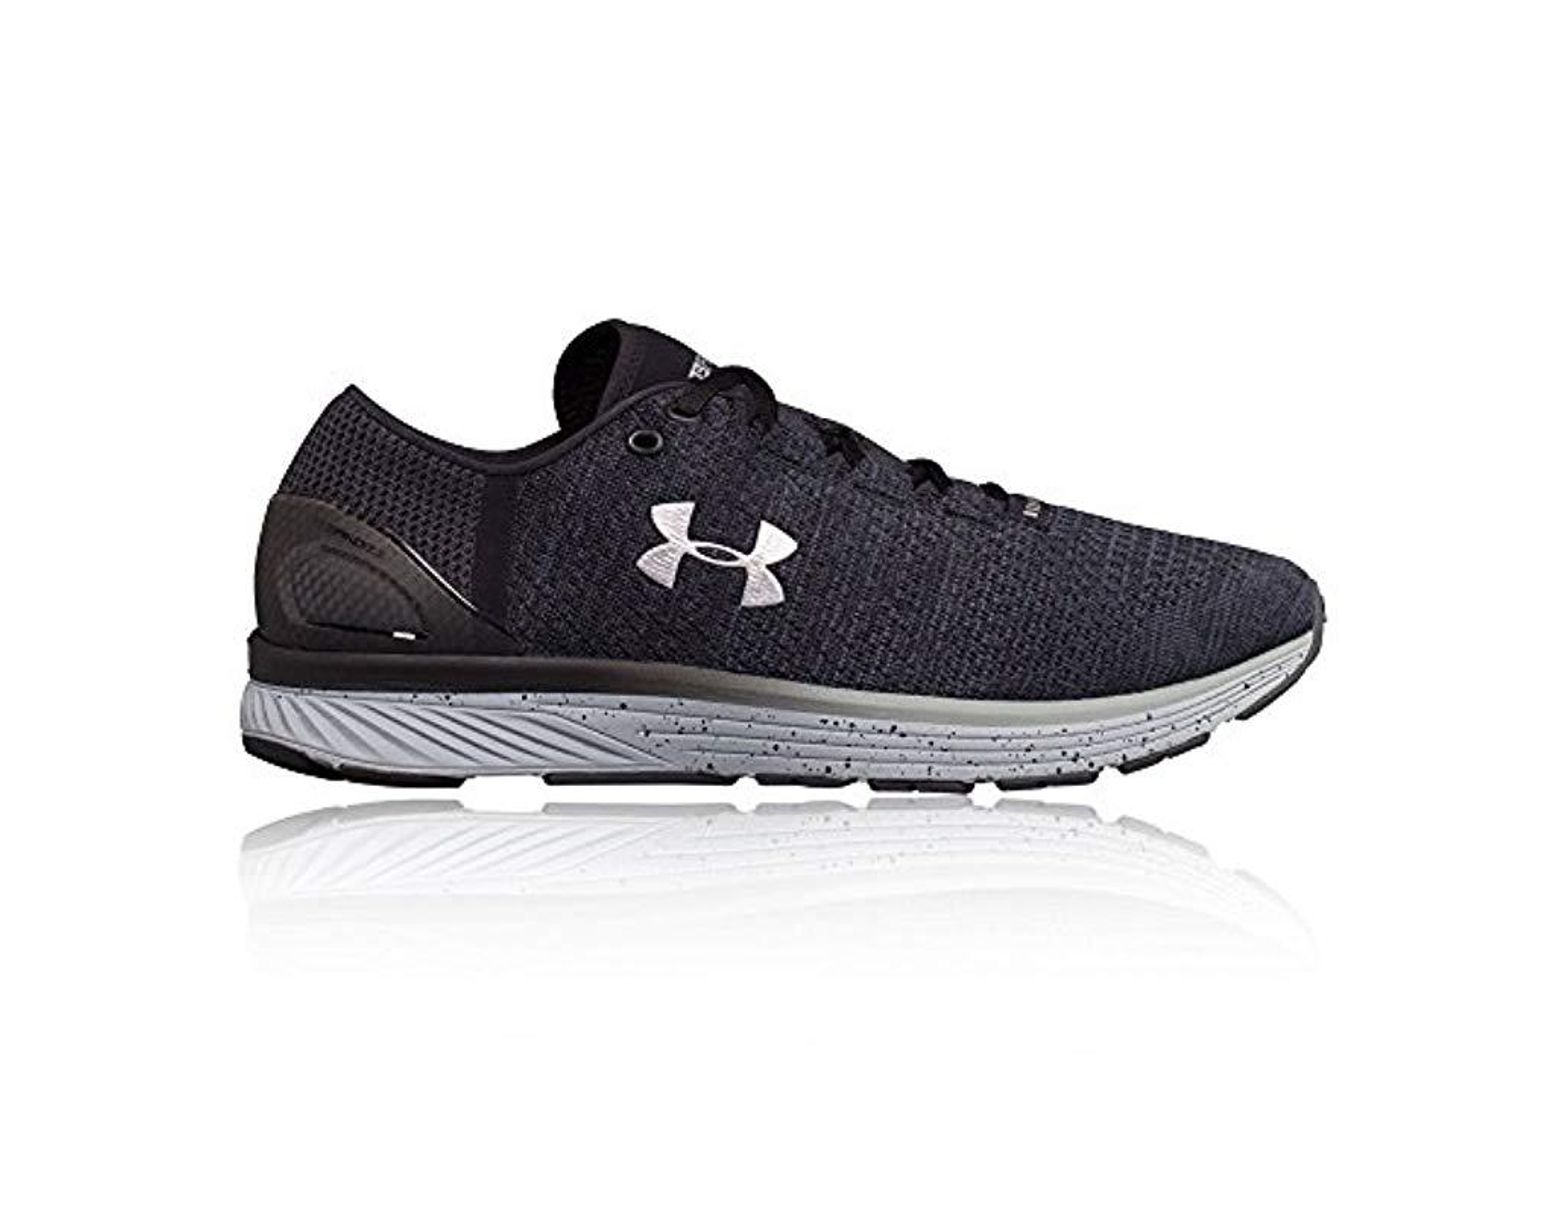 ec48c02e8df92 Men's Gray Ua Charged Bandit 3 1295725-008 Running Shoes